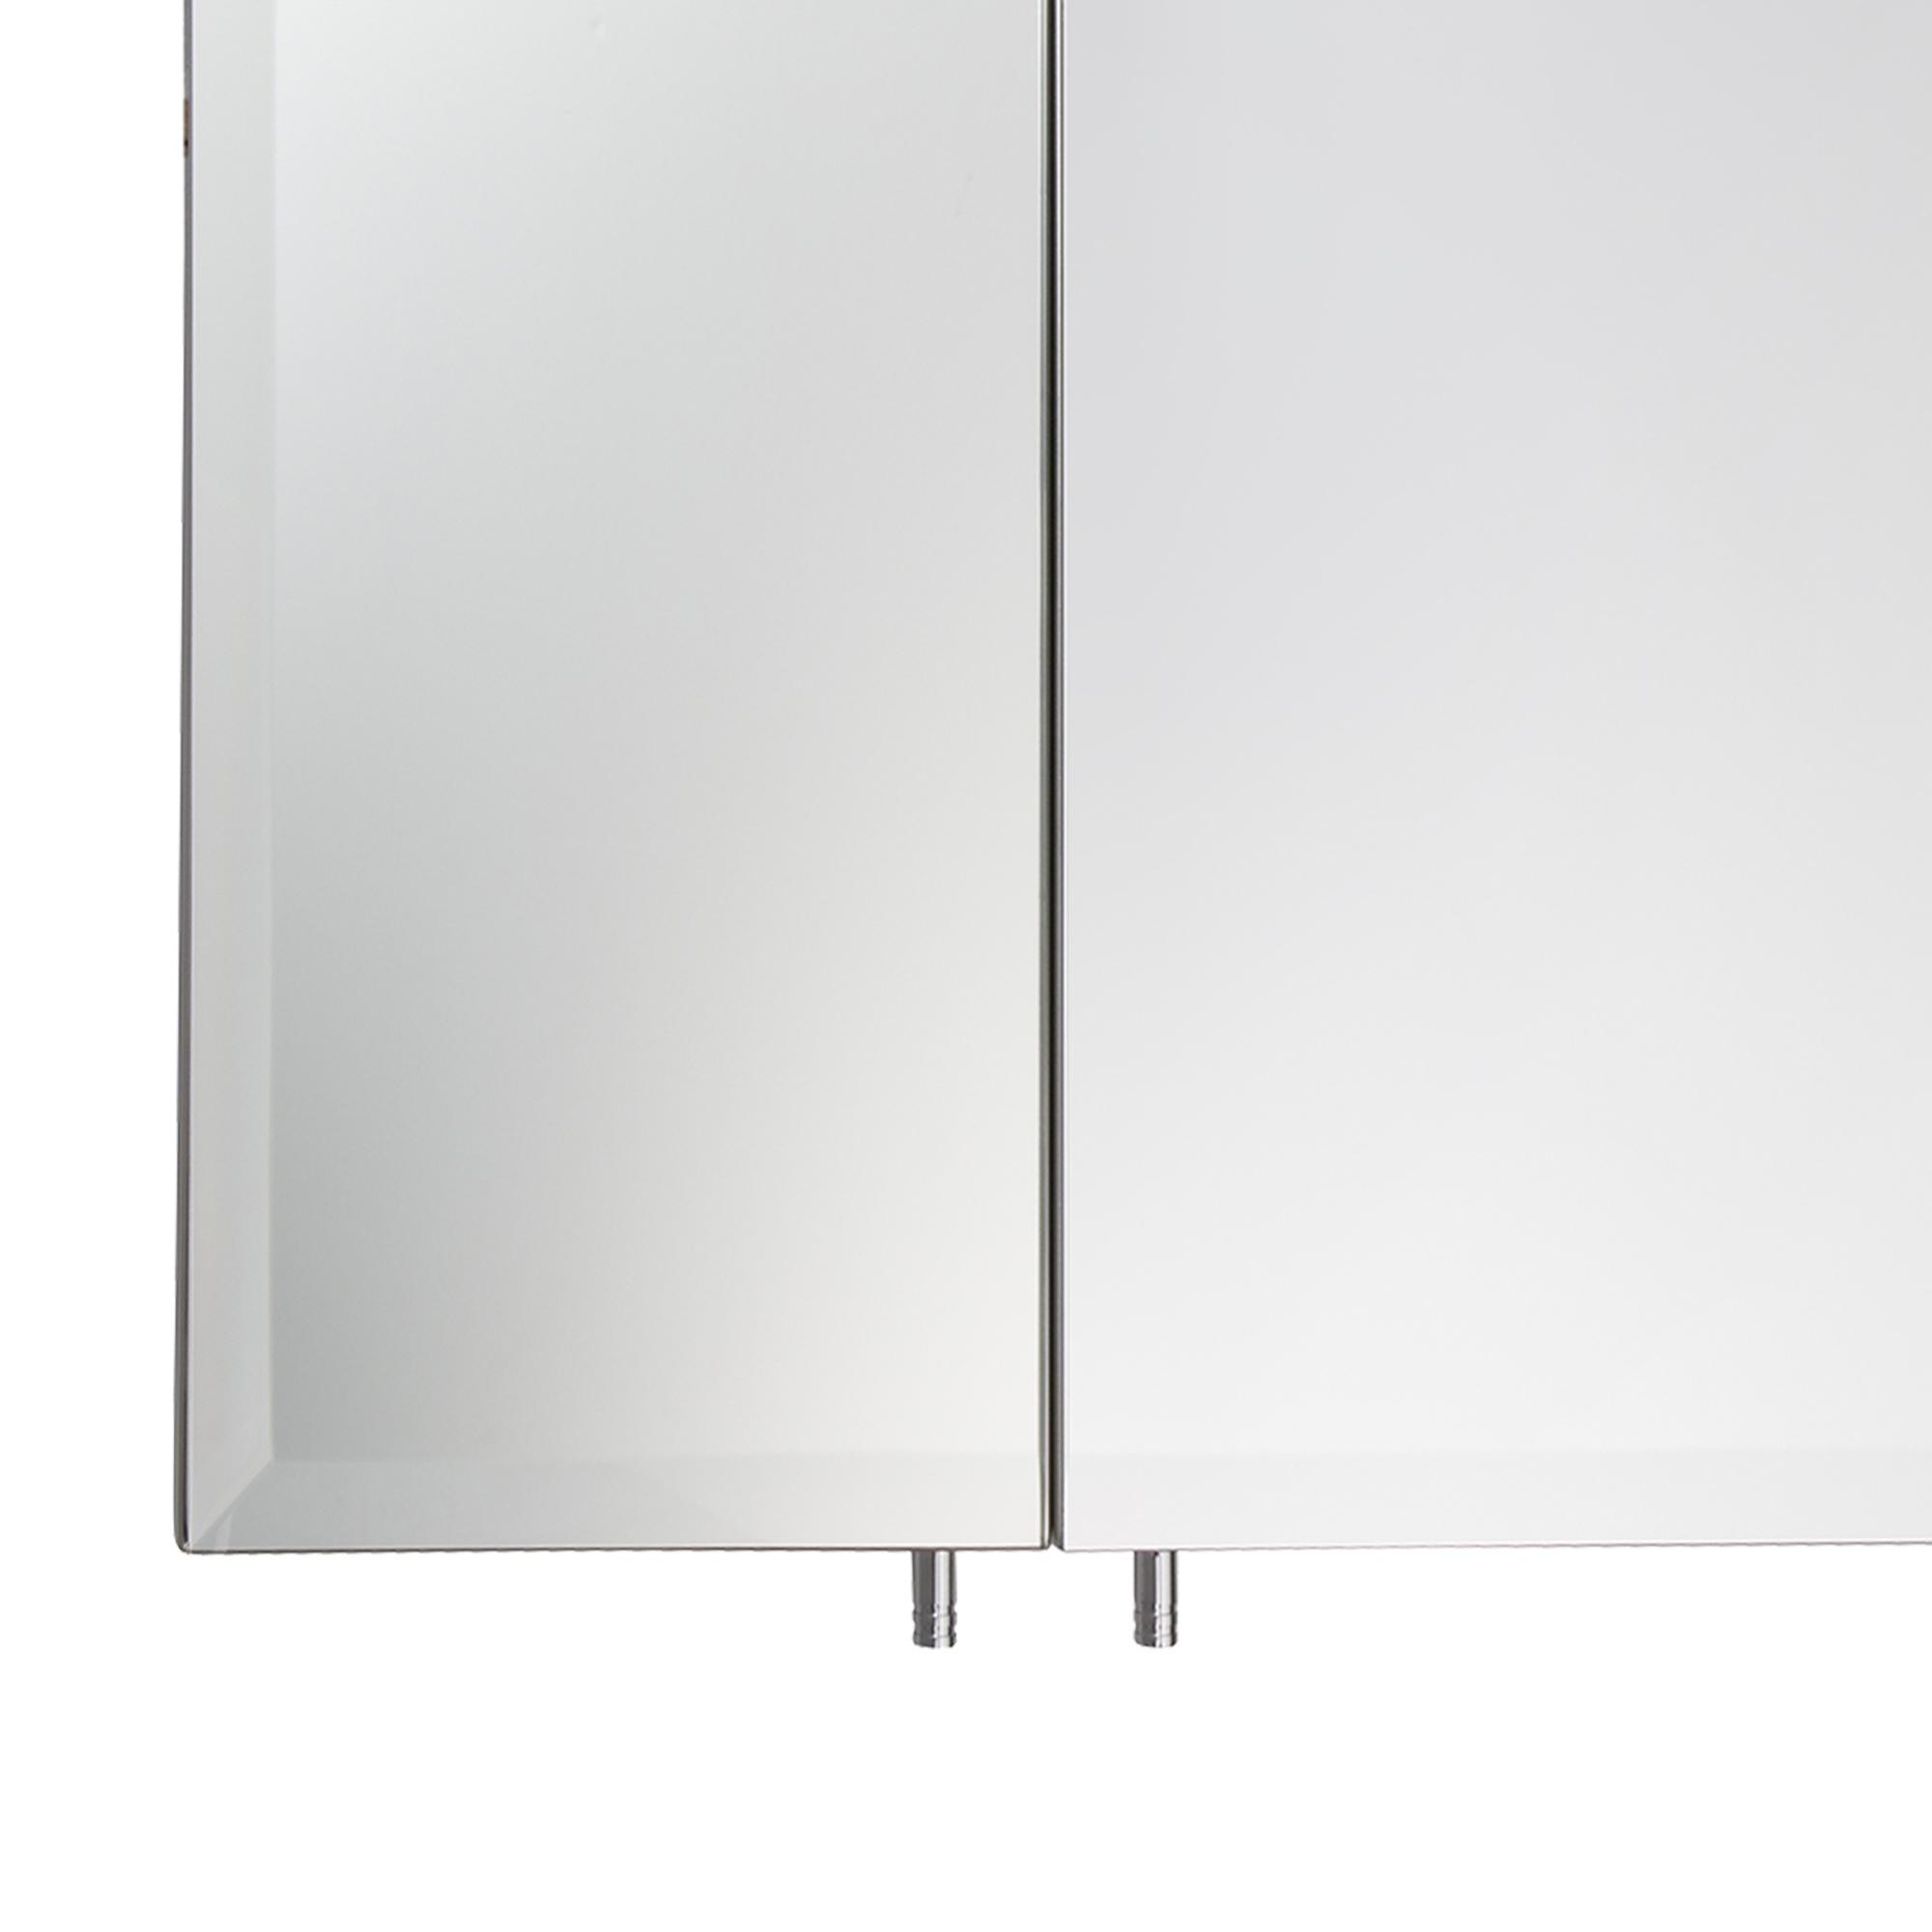 2 Or 3 Door Stainless Steel Wall Mounted Mirror Bathroom